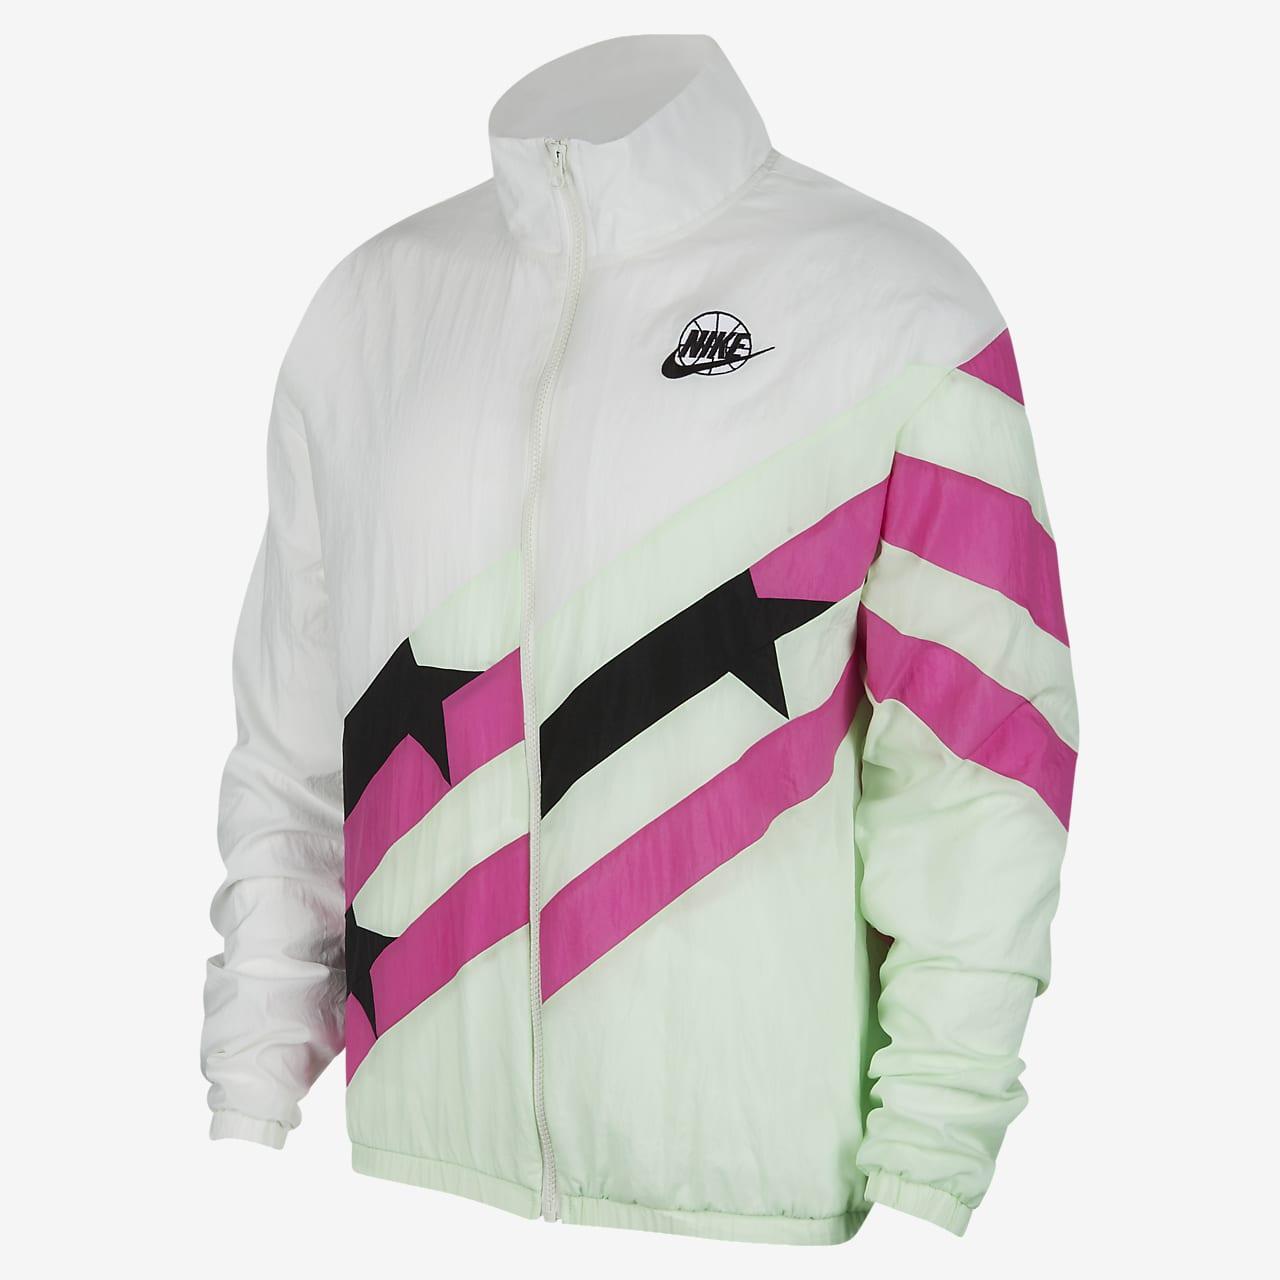 Basketball Tracksuit Jacket. Nike ID